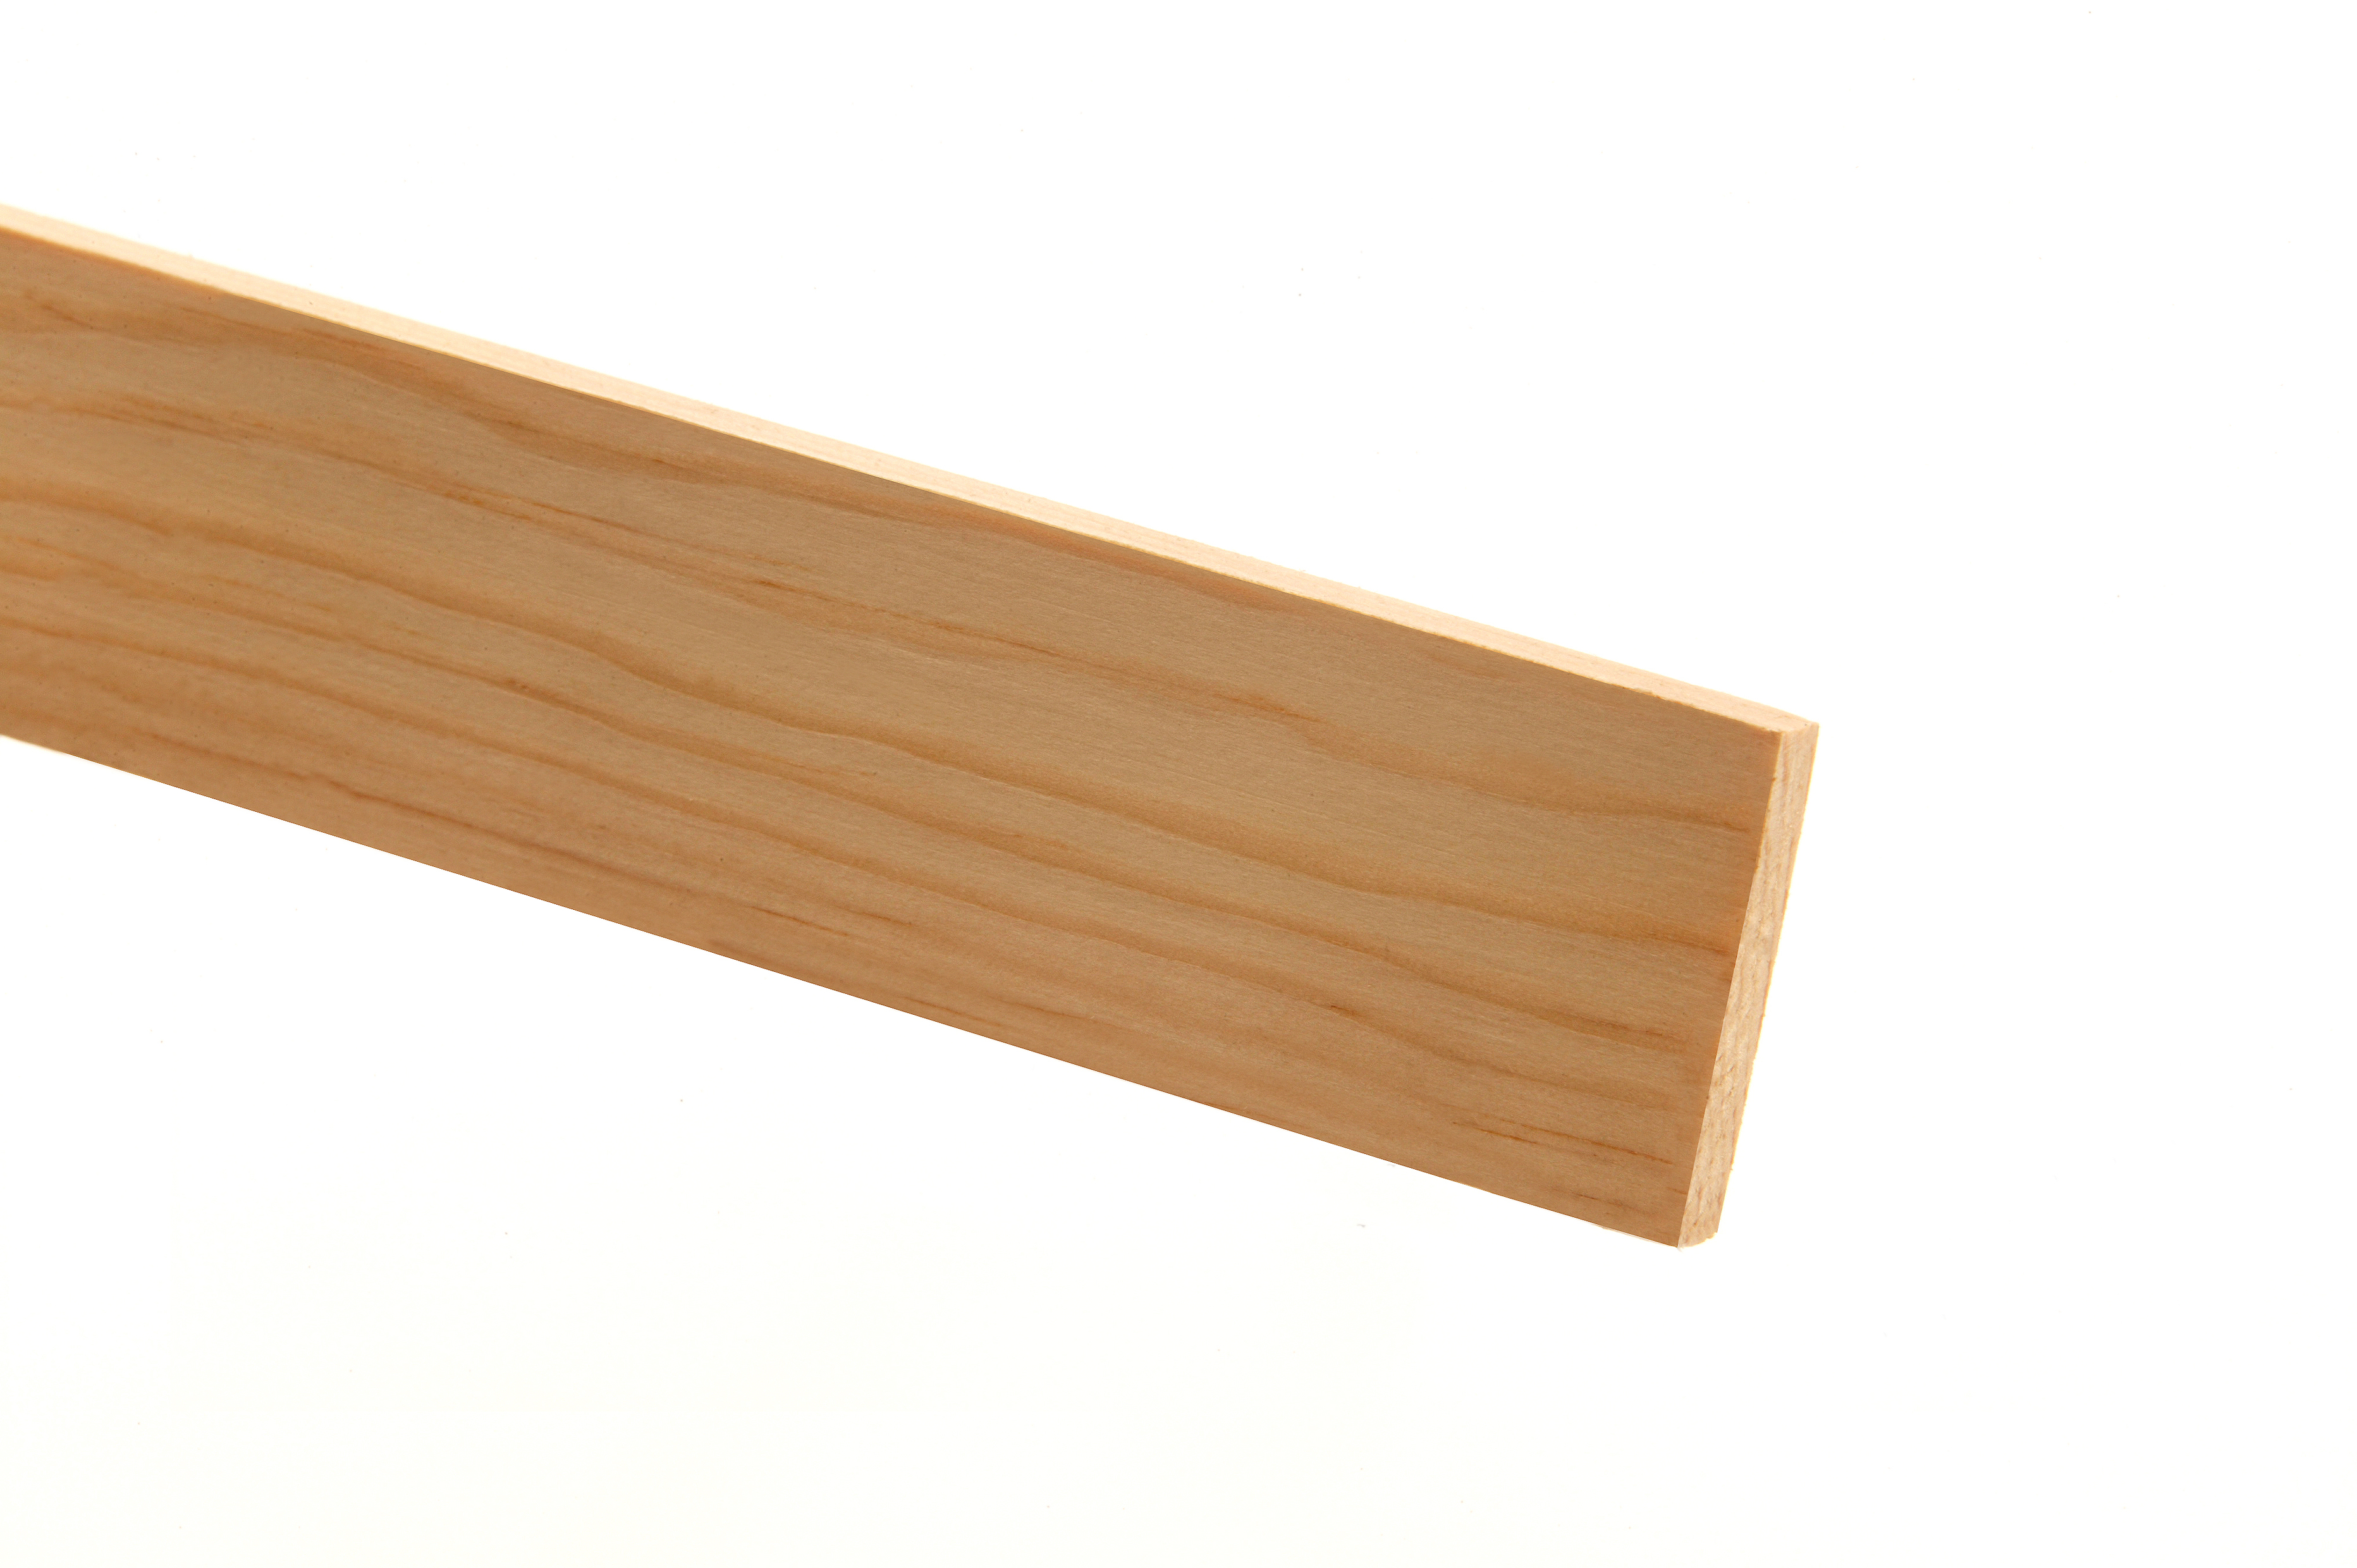 10 Pine PSE Stripwood 34 x 46 x 2400mm